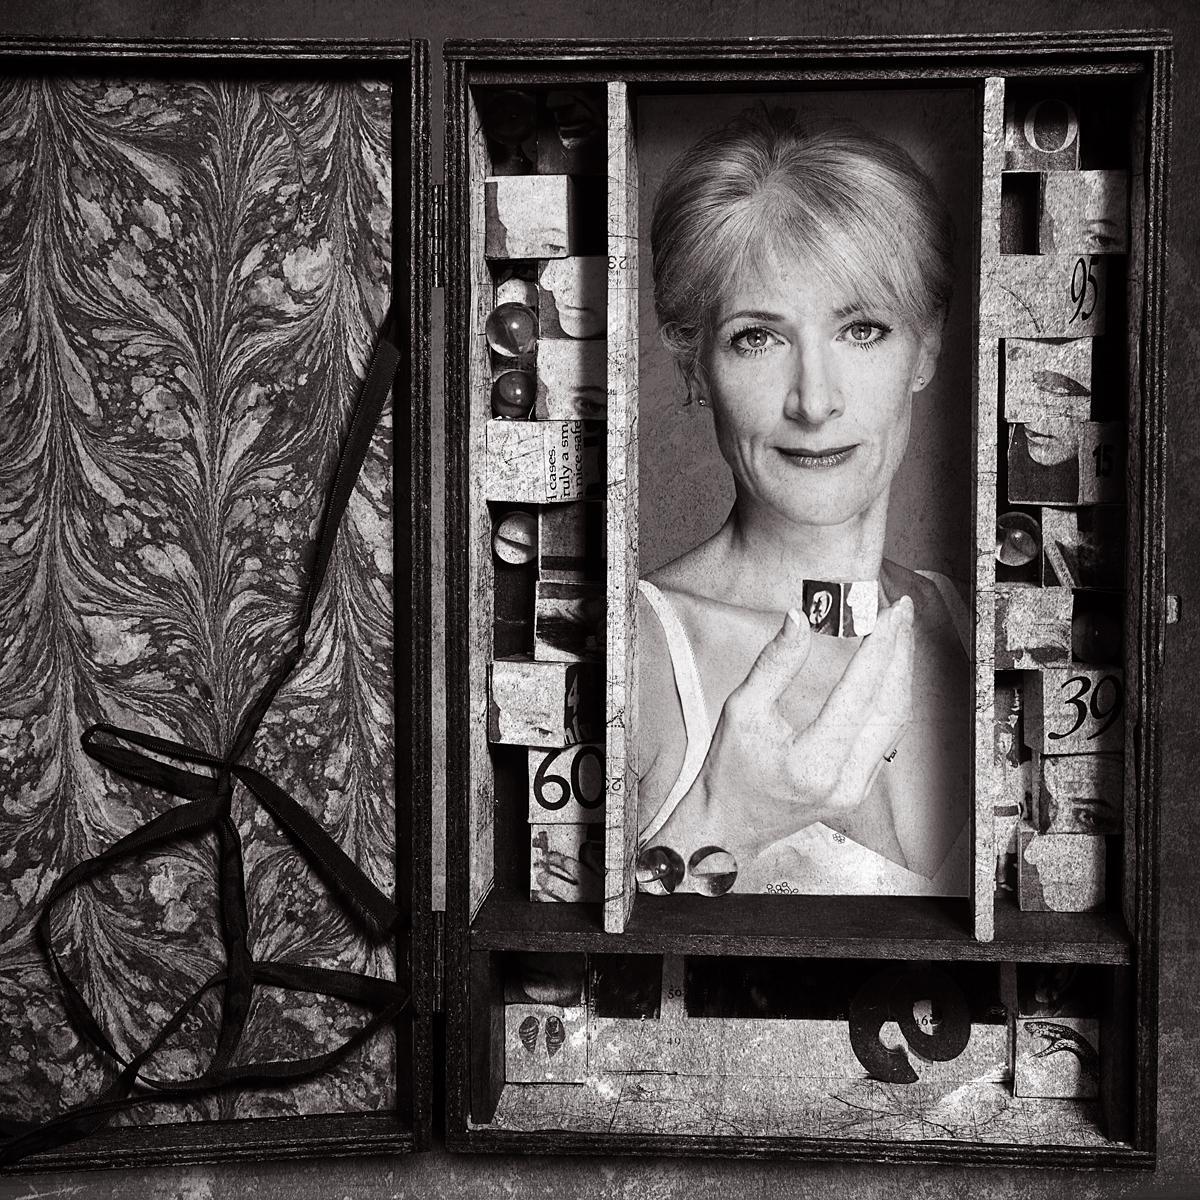 Portrait of Rosie Arnold for Shots Magazine by Creative Photographer Julian Hanford